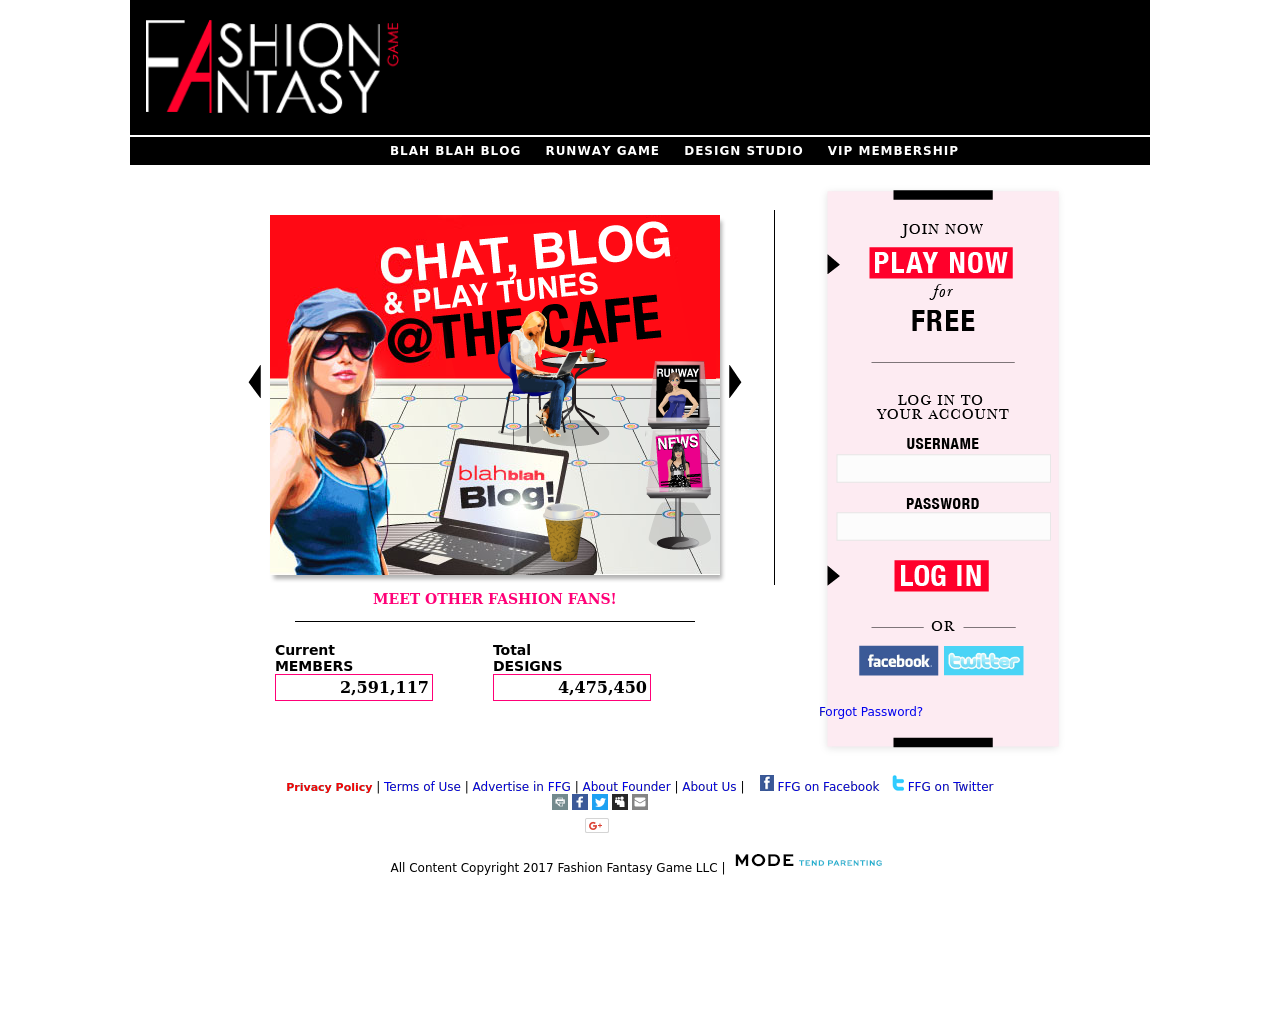 Fashion-Fantasy-Game-Advertising-Reviews-Pricing